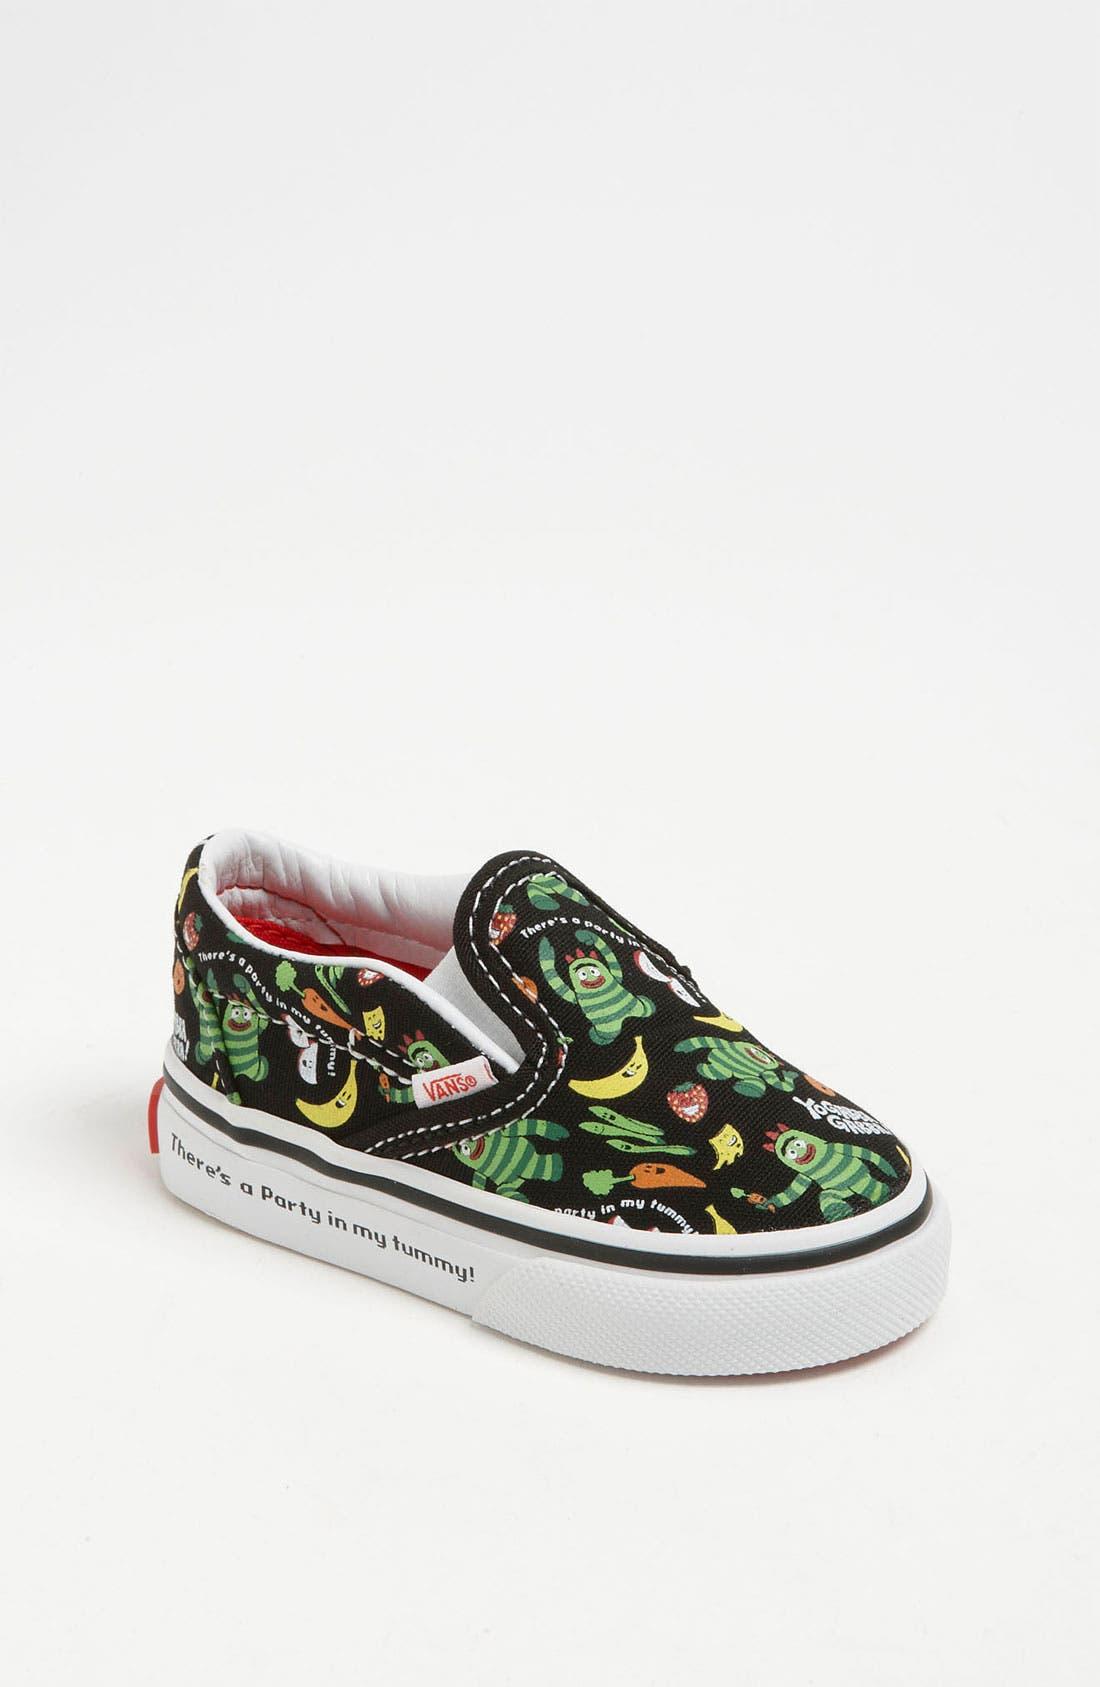 Alternate Image 1 Selected - Vans 'Classic - Yo Gabba Gabba!™' Slip-On Sneaker (Baby, Walker & Toddler)